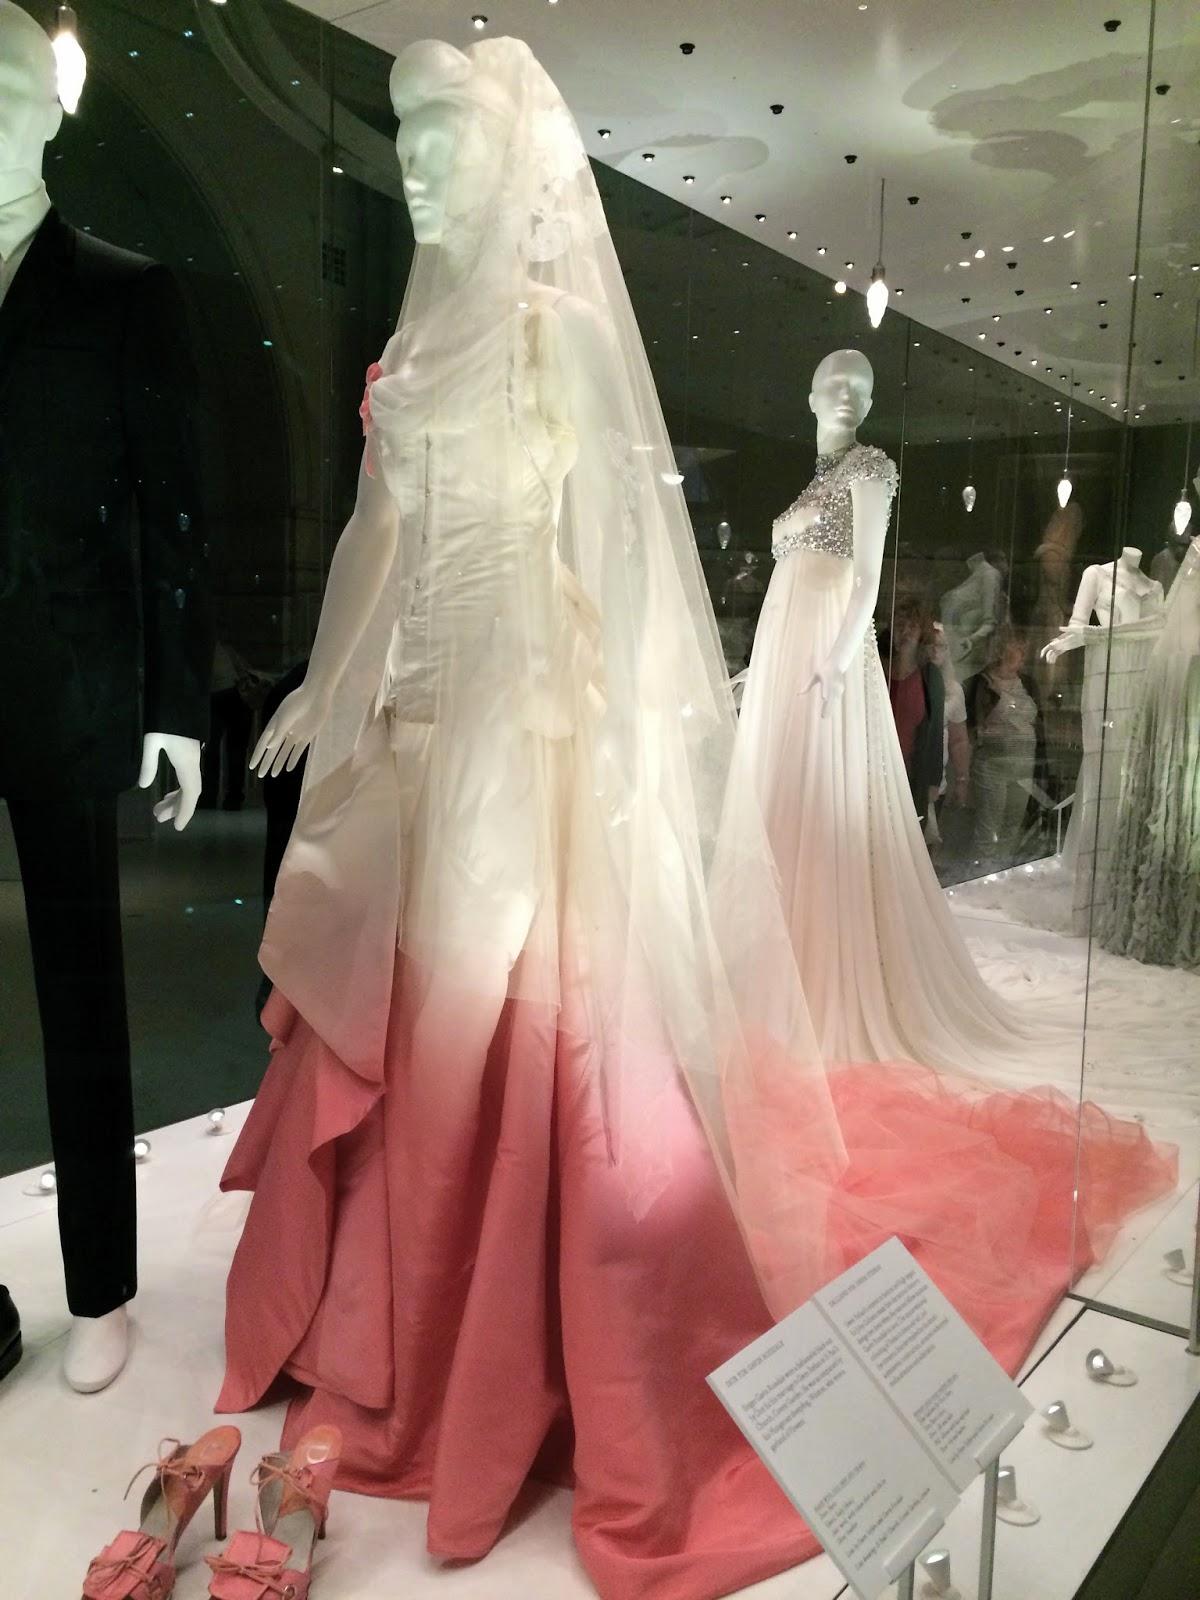 Love life in wedding dresses at the va john galliano for dior gwen stefanis wedding dress 2002 junglespirit Gallery